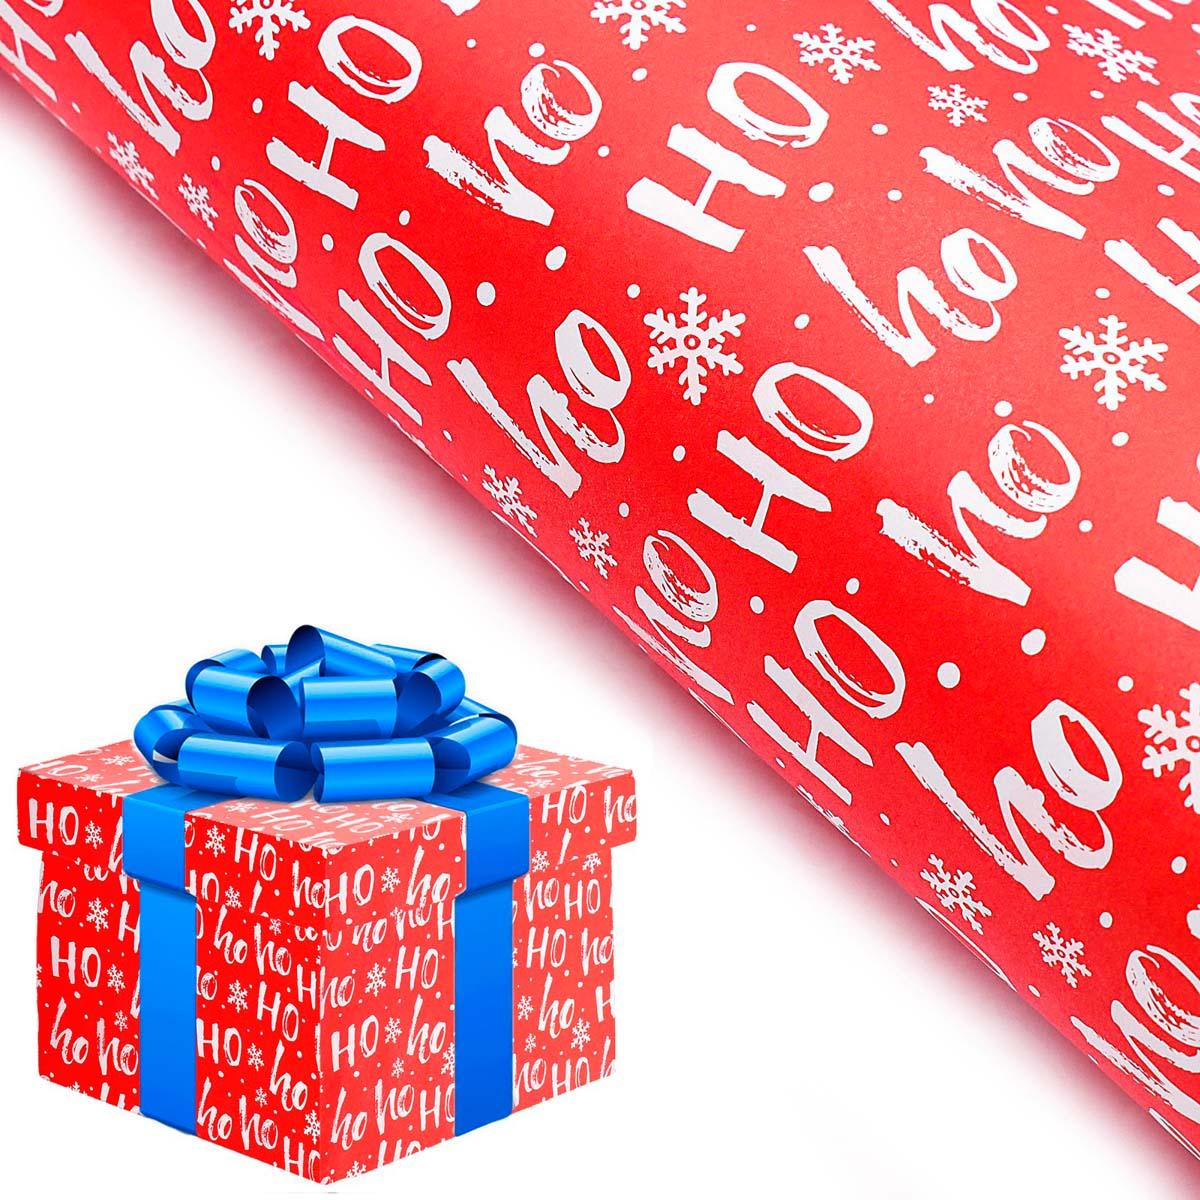 3862939 Бумага упаковочная 'Ho-Ho', 100*67 см